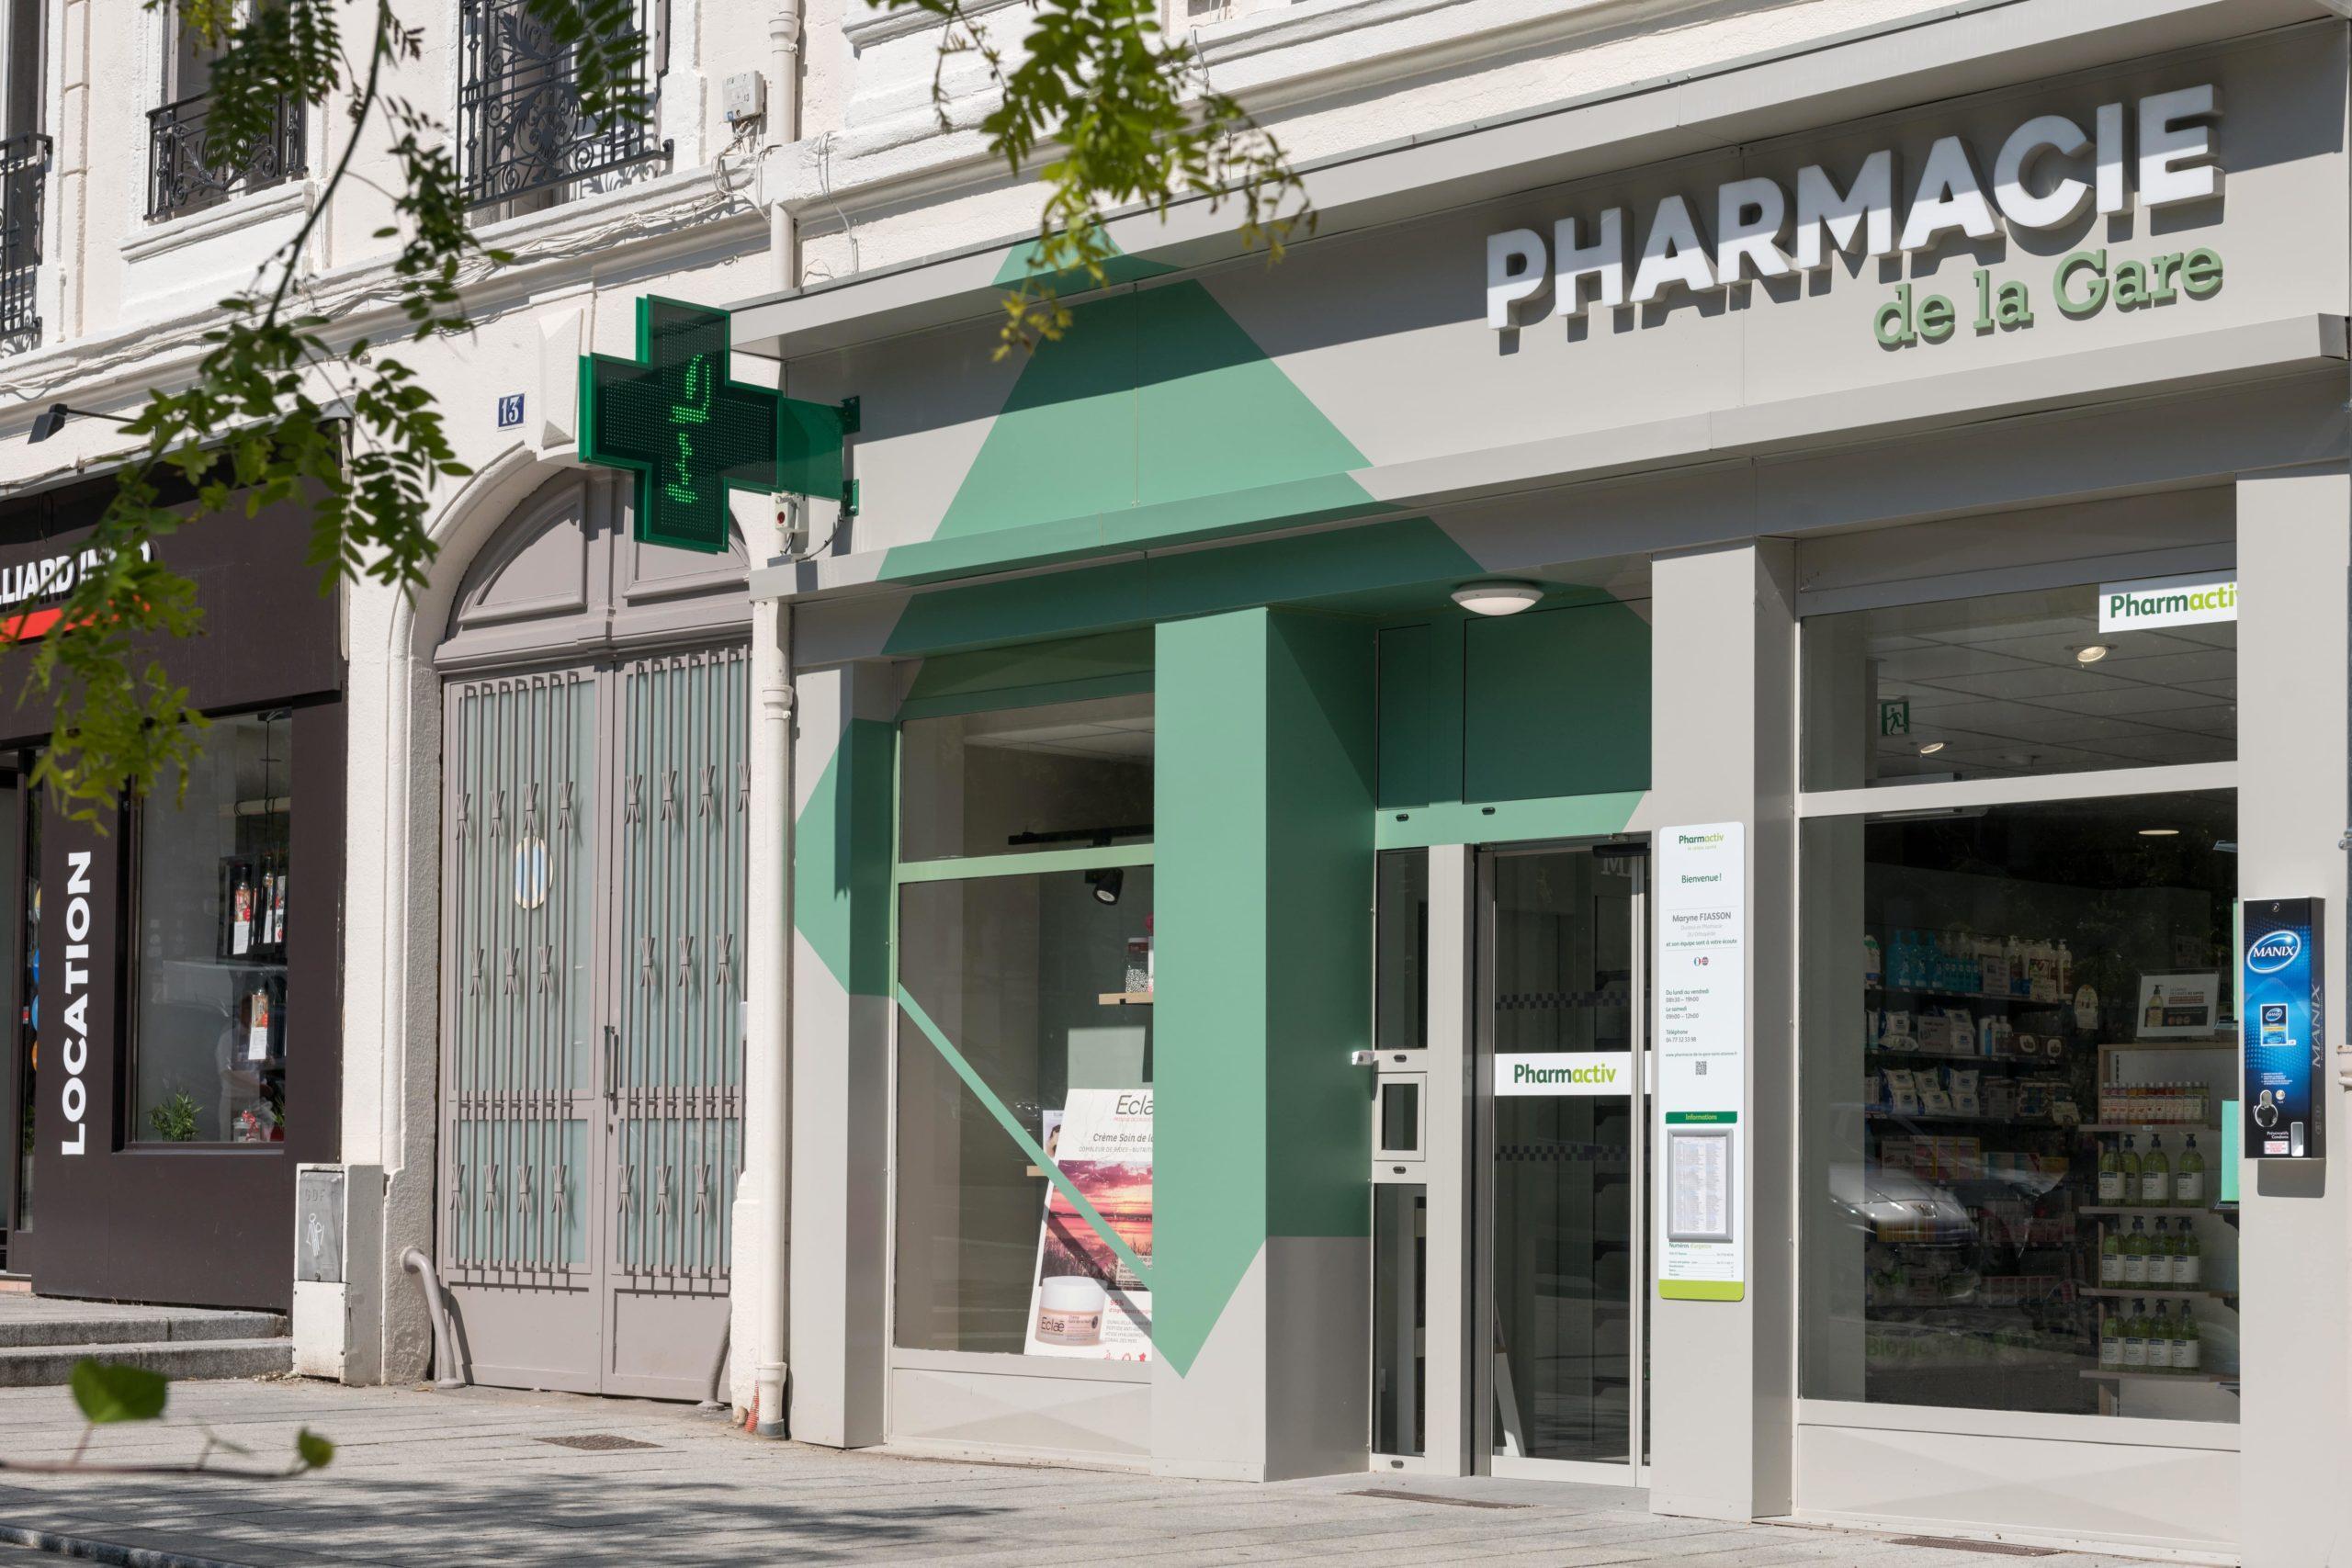 Façade rénovée de la pharmacie de la Gare